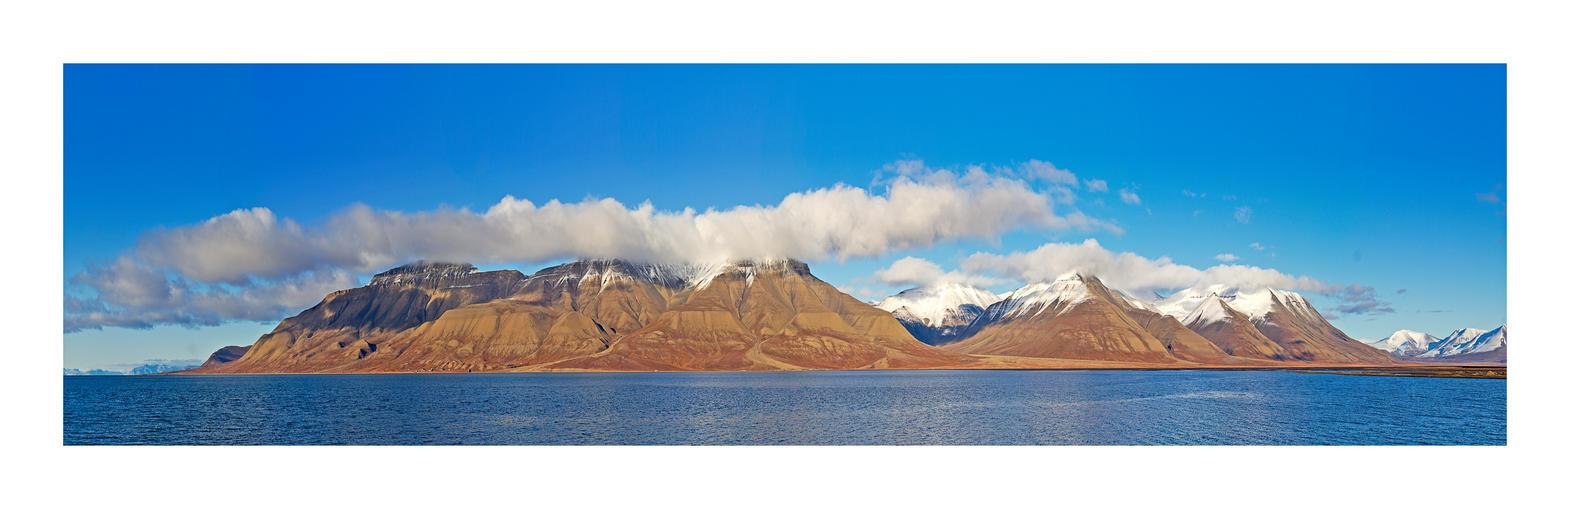 Longyear view by Guardingdark